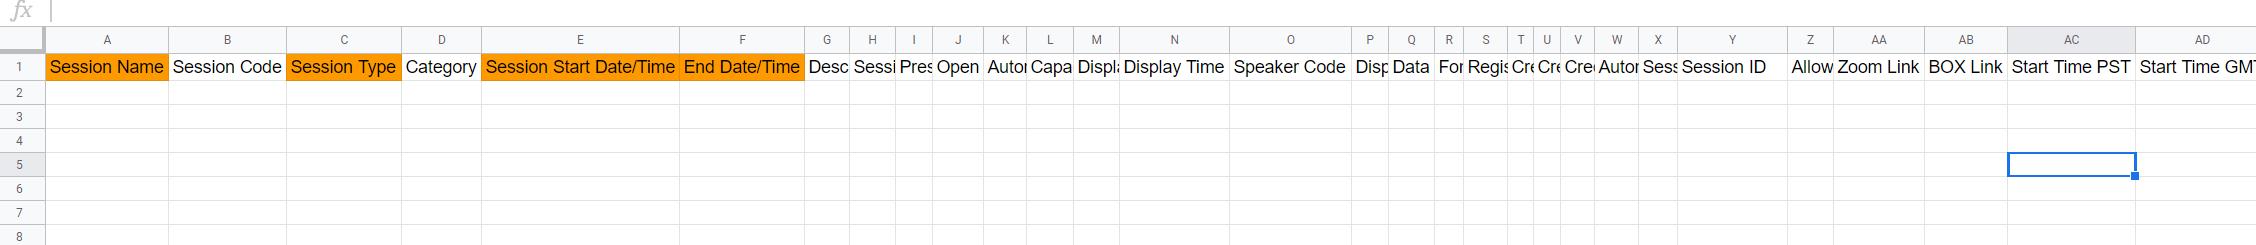 sample of csv to upload for data.